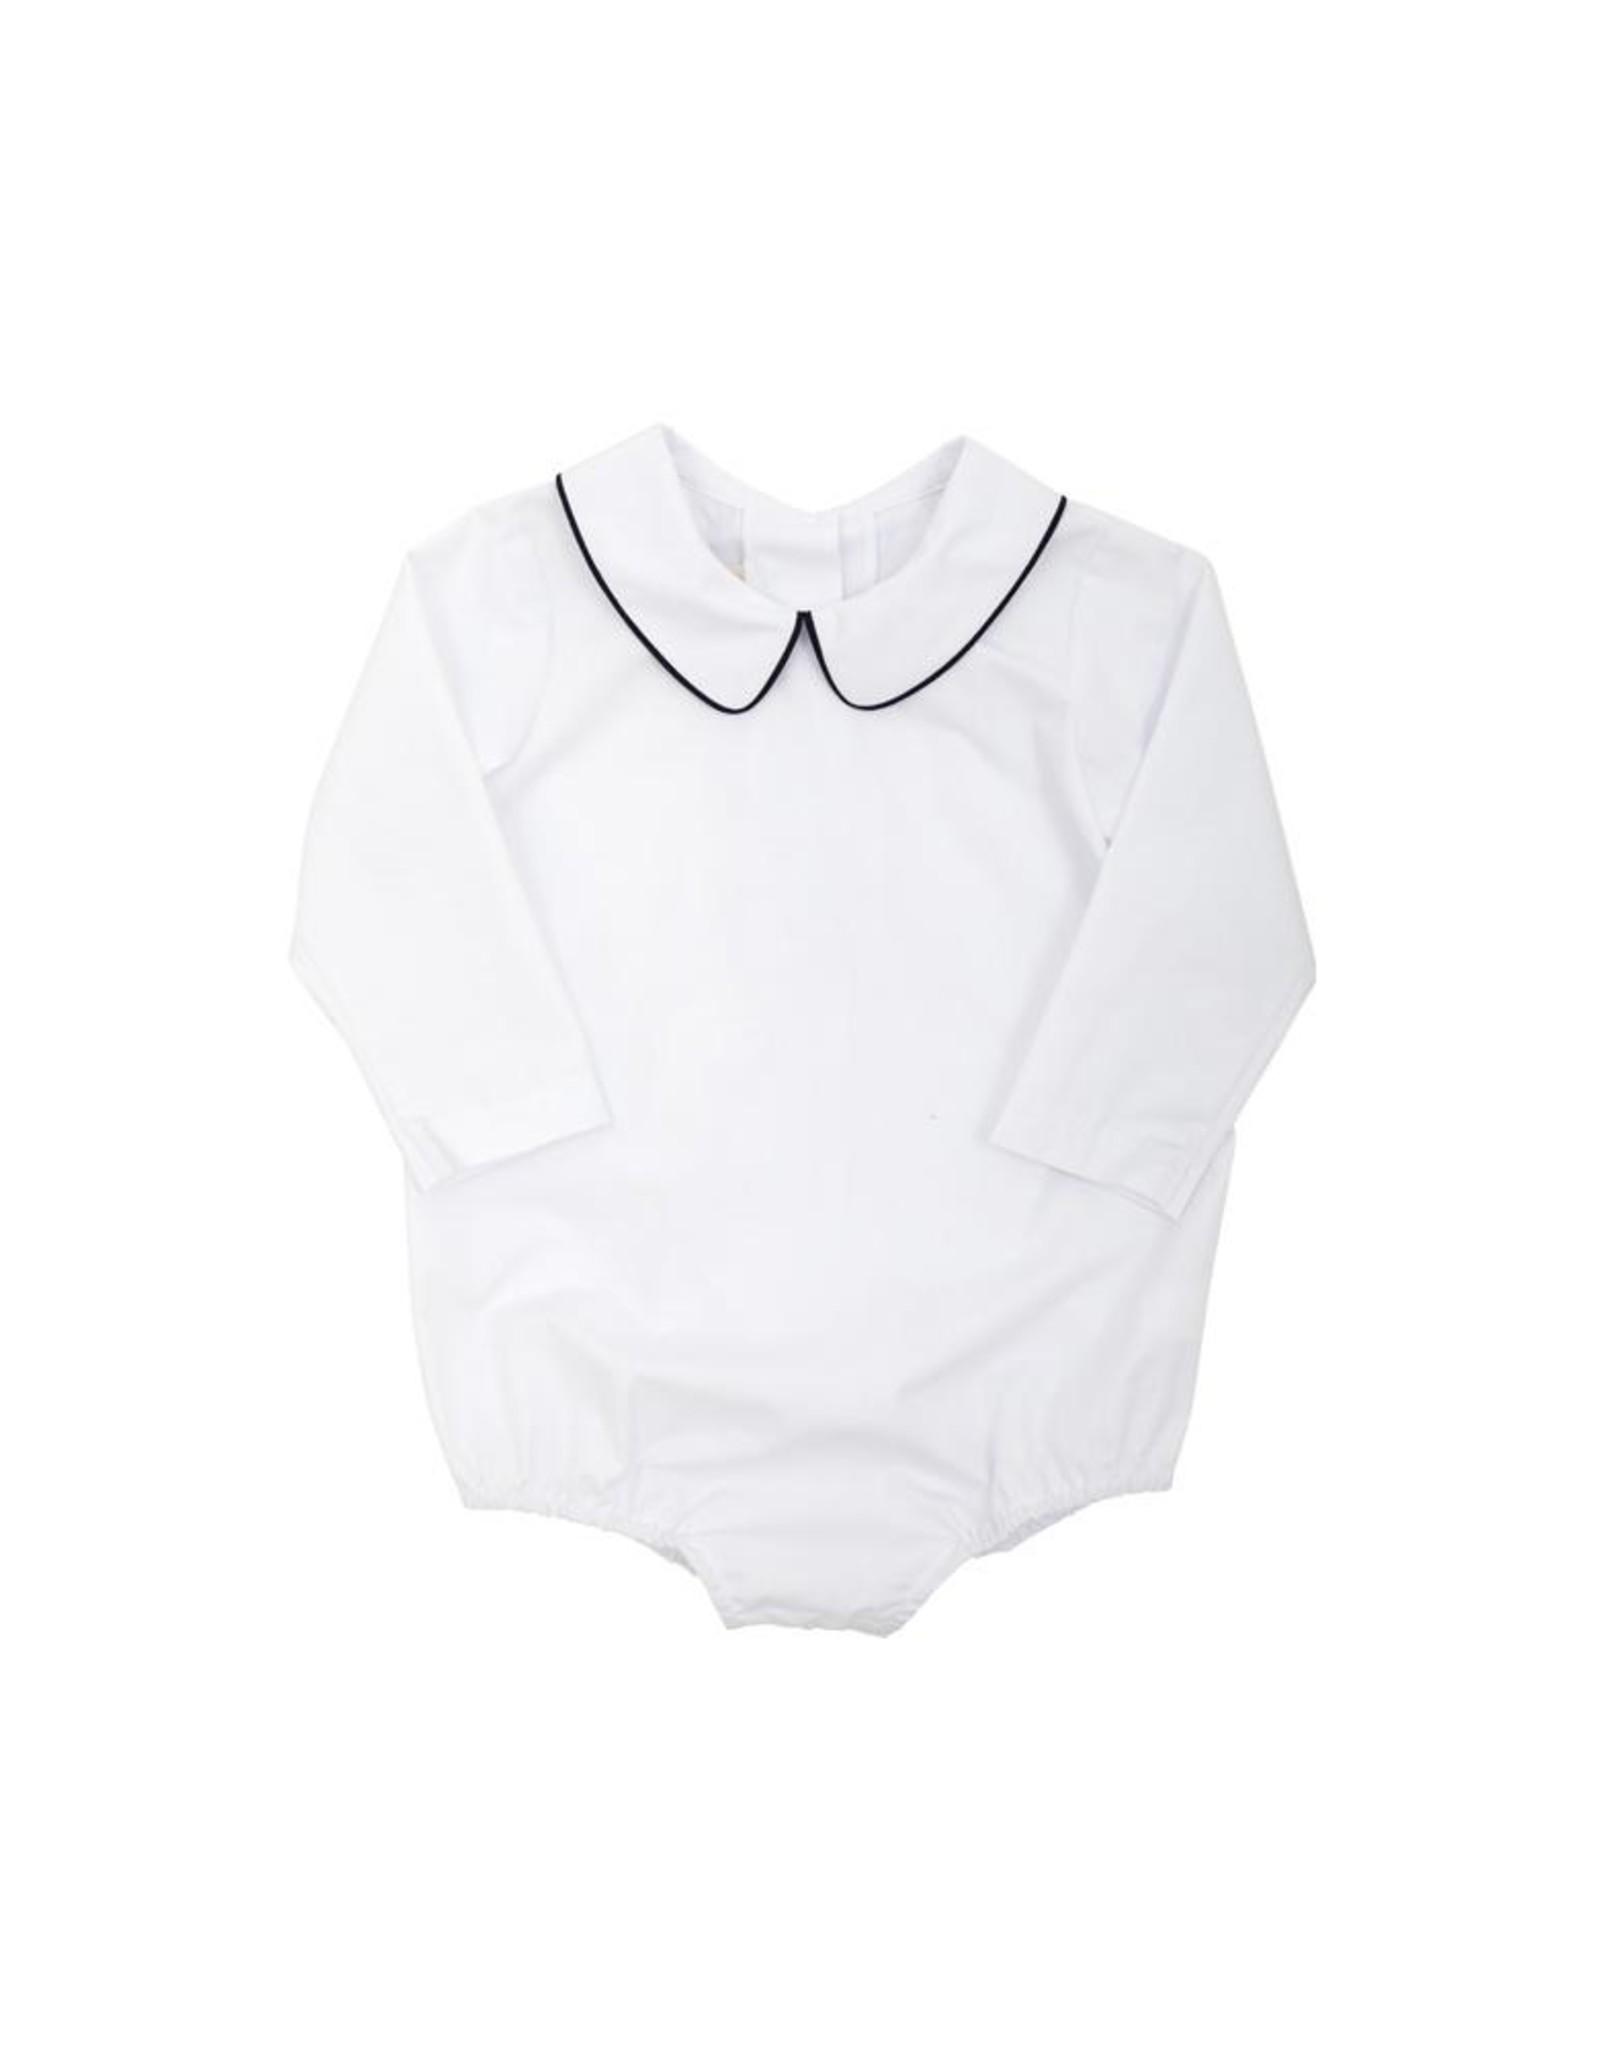 The Beaufort Bonnet Company LS Woven Peter Pan Collar Shirt, White w/Navy